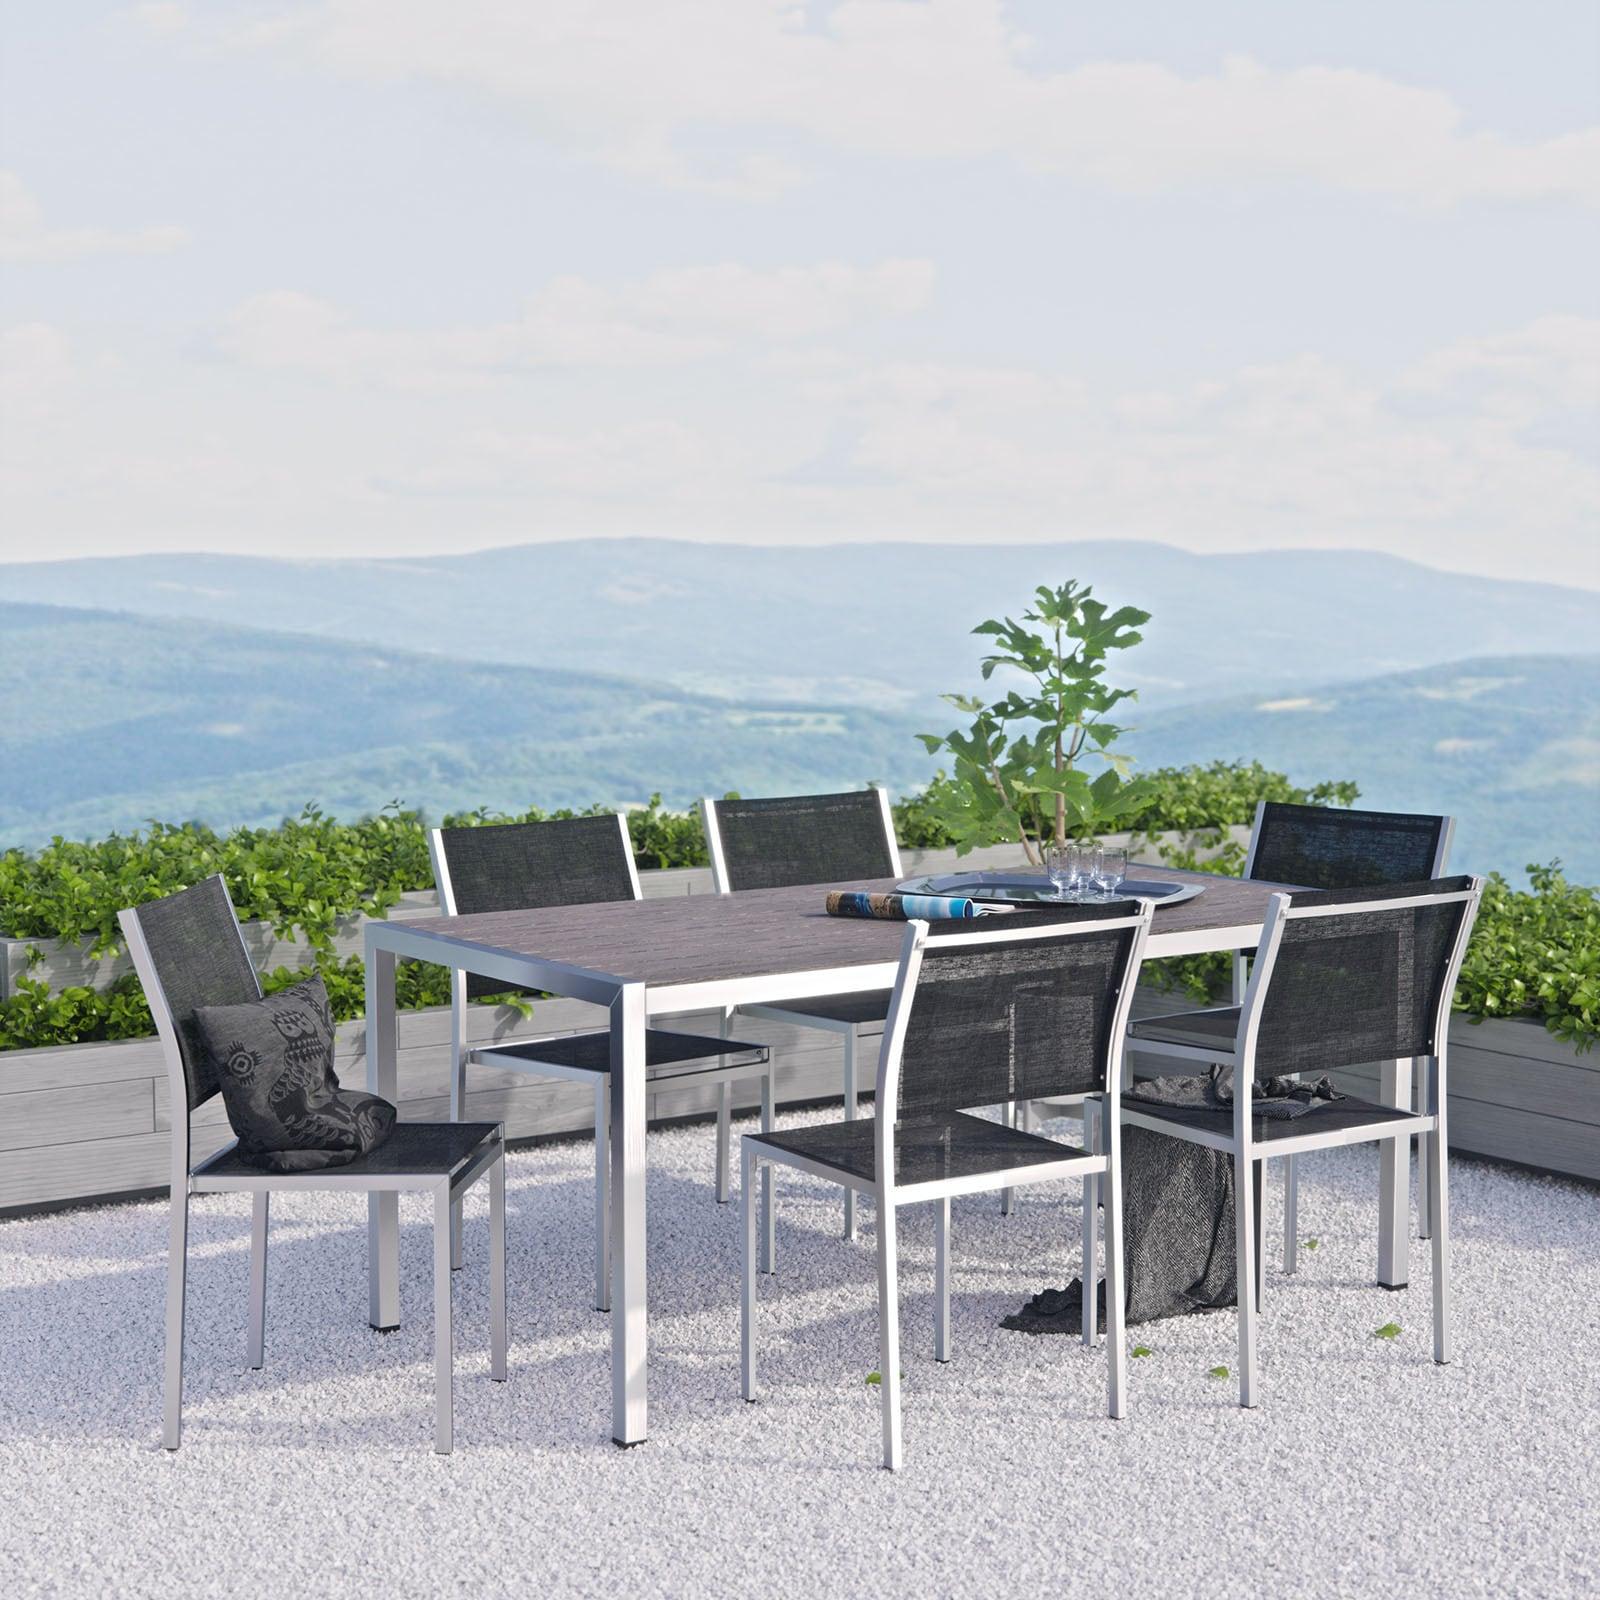 Modway Shore 7 Piece Outdoor Patio Aluminum Dining Set (S...